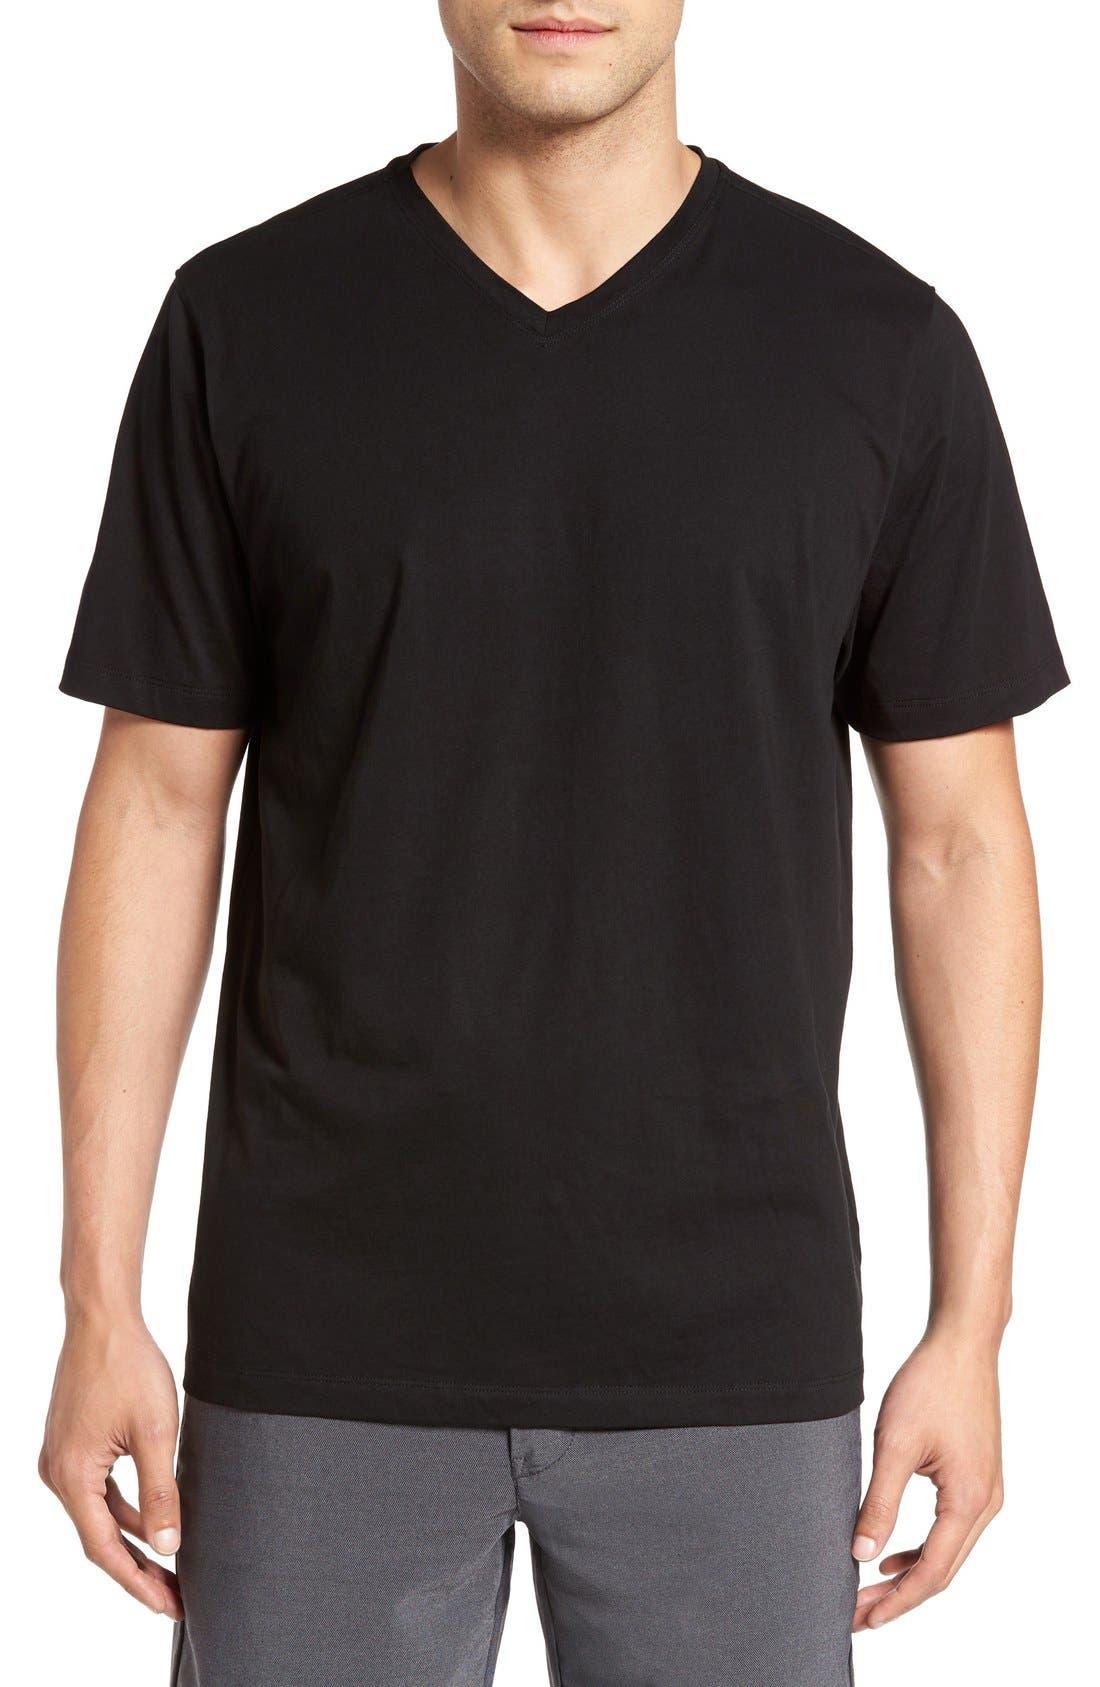 Alternate Image 1 Selected - Cutter & Buck Sida V-Neck T-Shirt